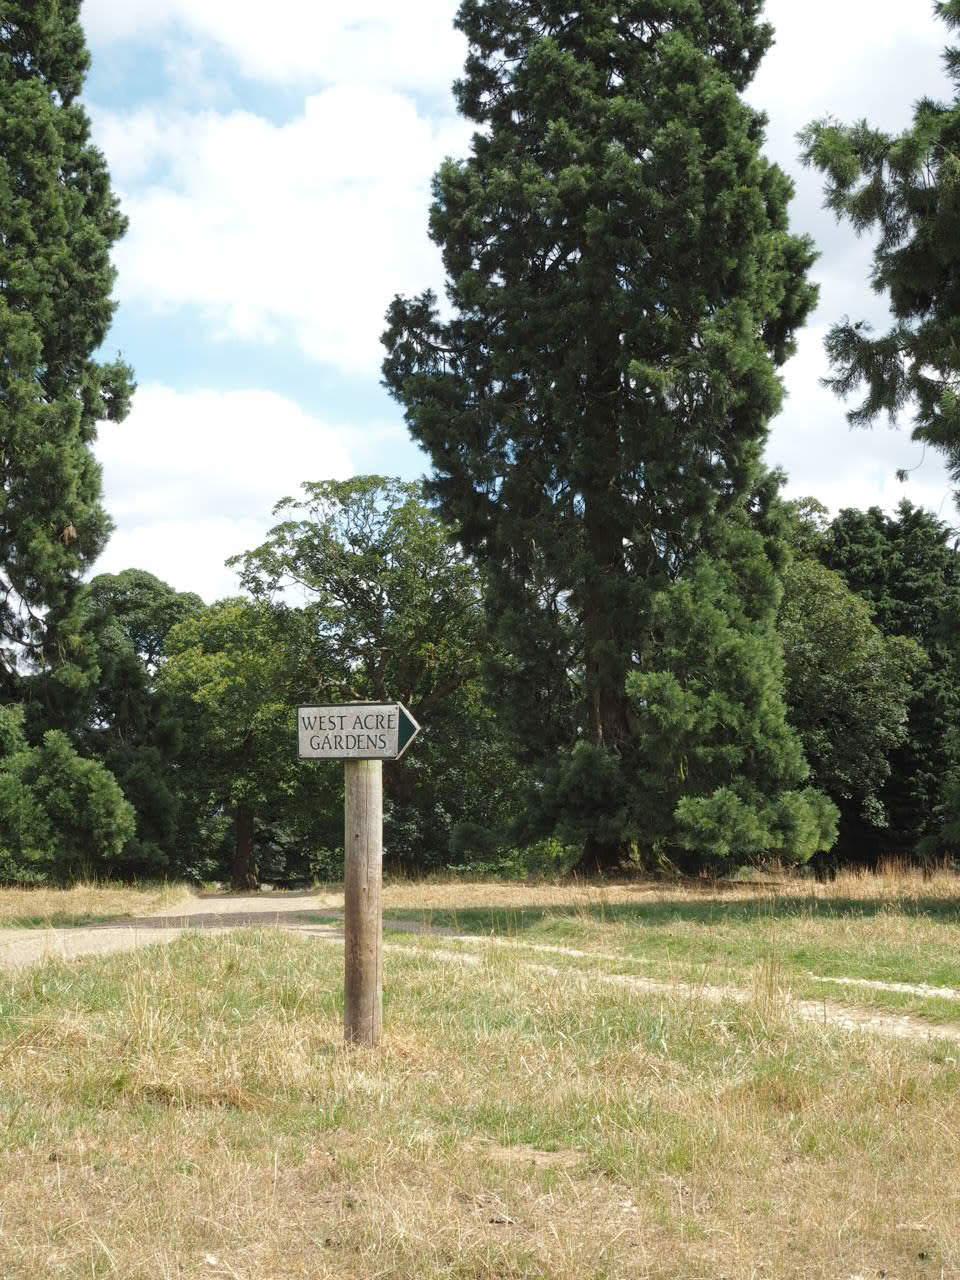 West acre gardens Norfolk